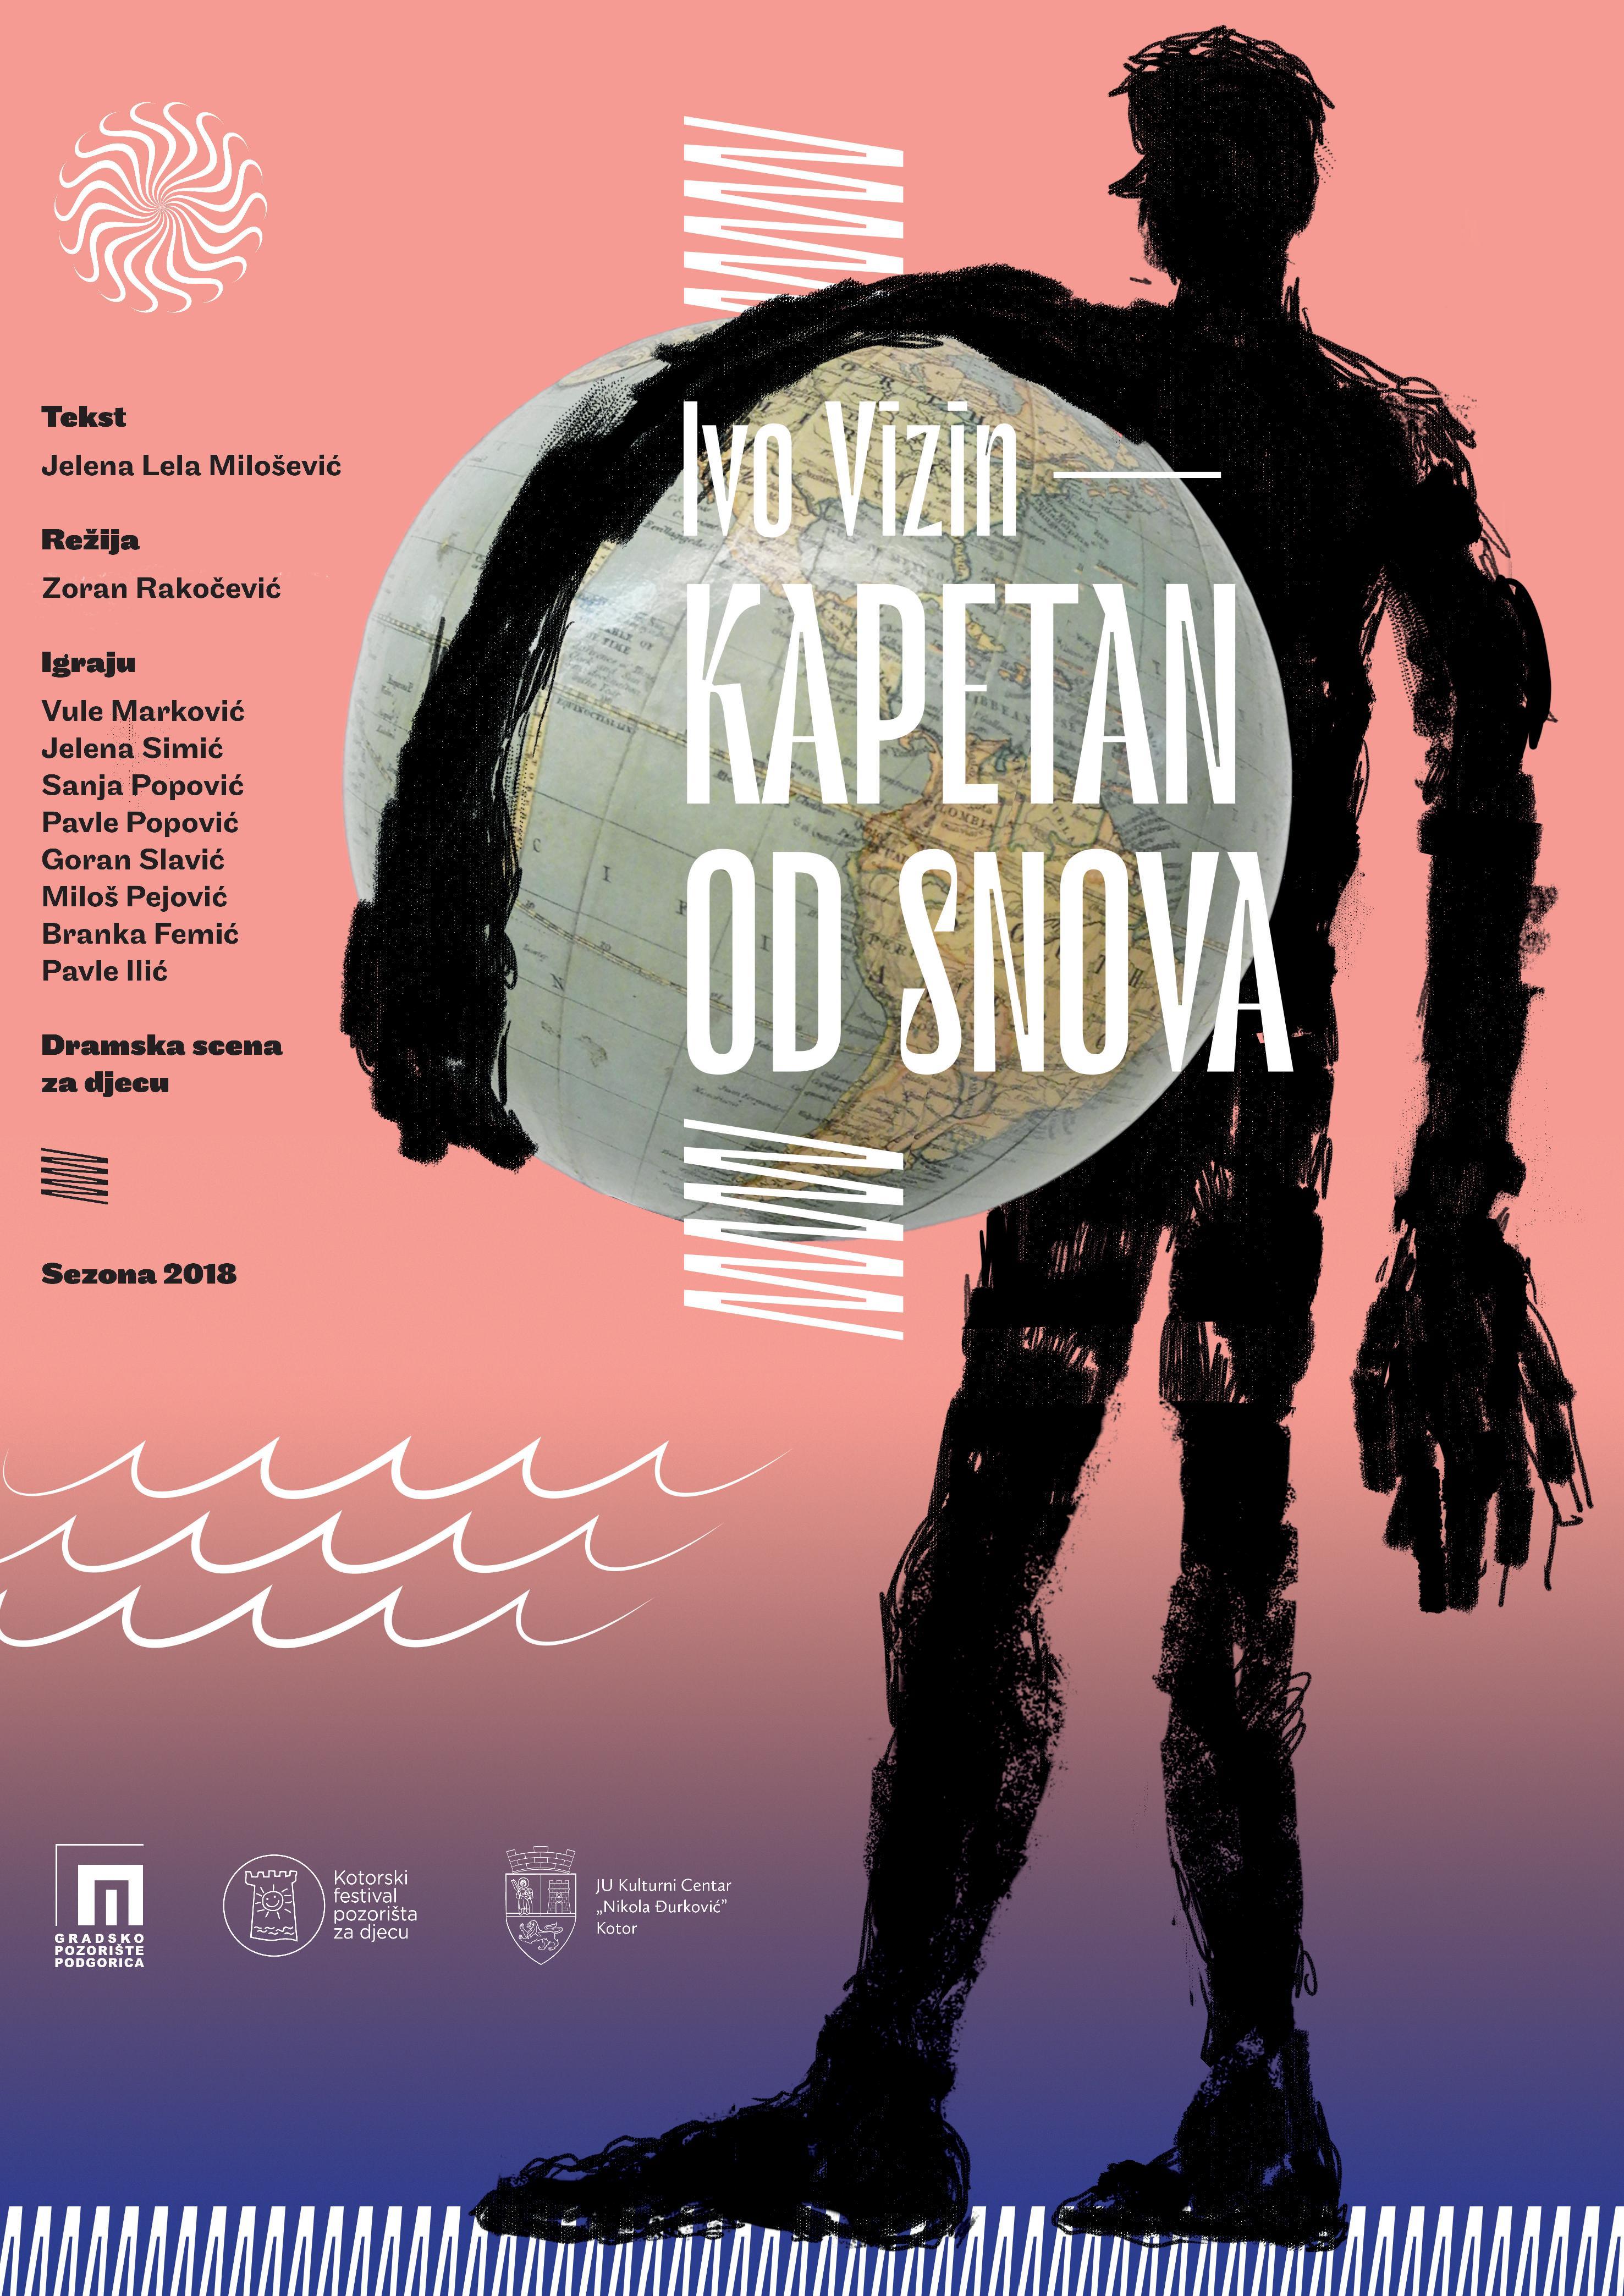 Ivo Vizin - kapetan od snova (12+)